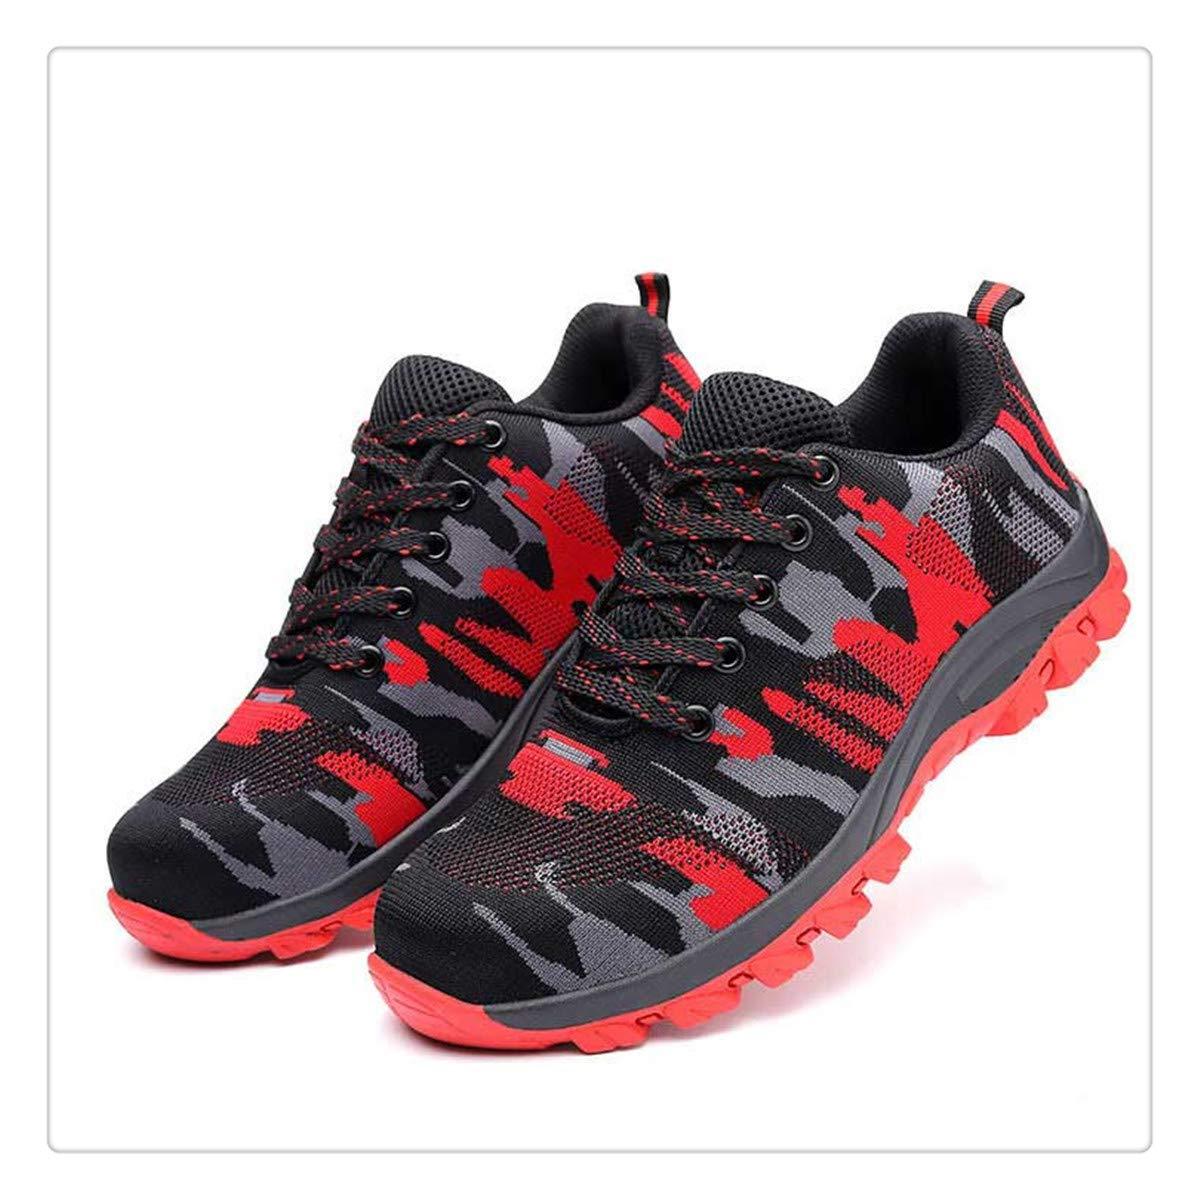 111f1f9b097ff Amazon.com | Uciquzhon Camouflage Steel Toe Shoes Men Work Boots ...